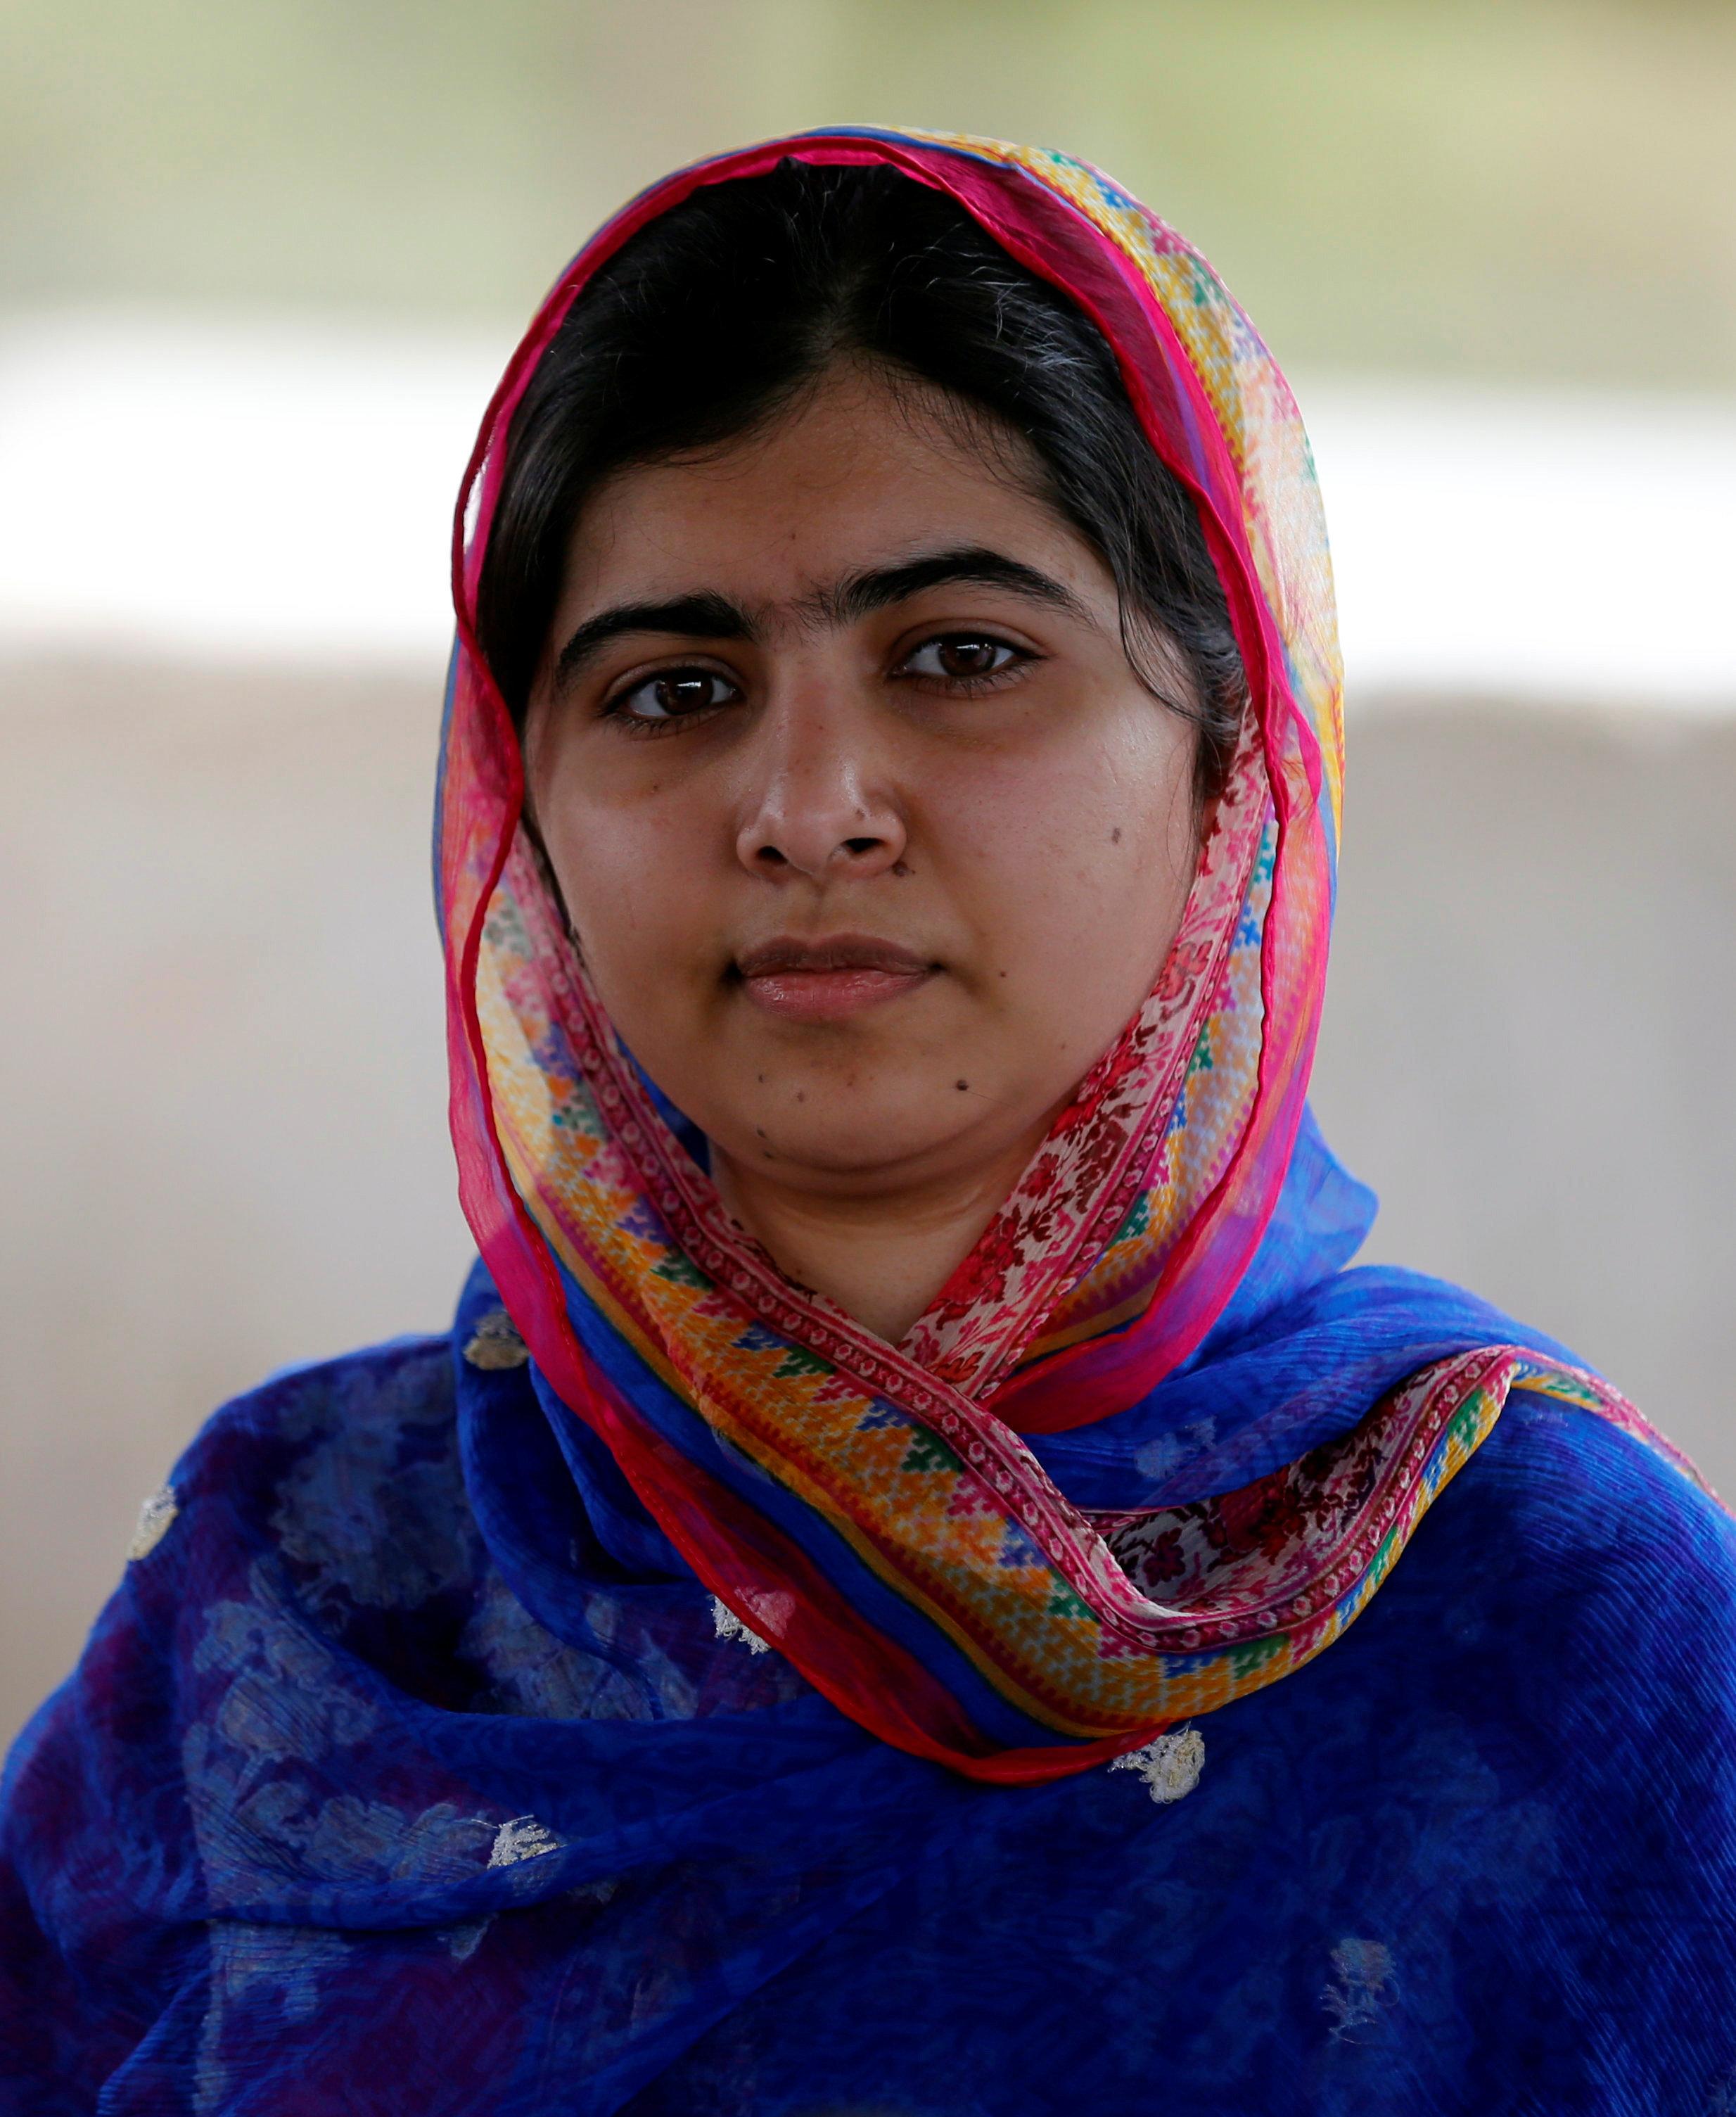 Malala Yousafzai on her 19th birthday, at a refugee camp near the Kenya-Somalia